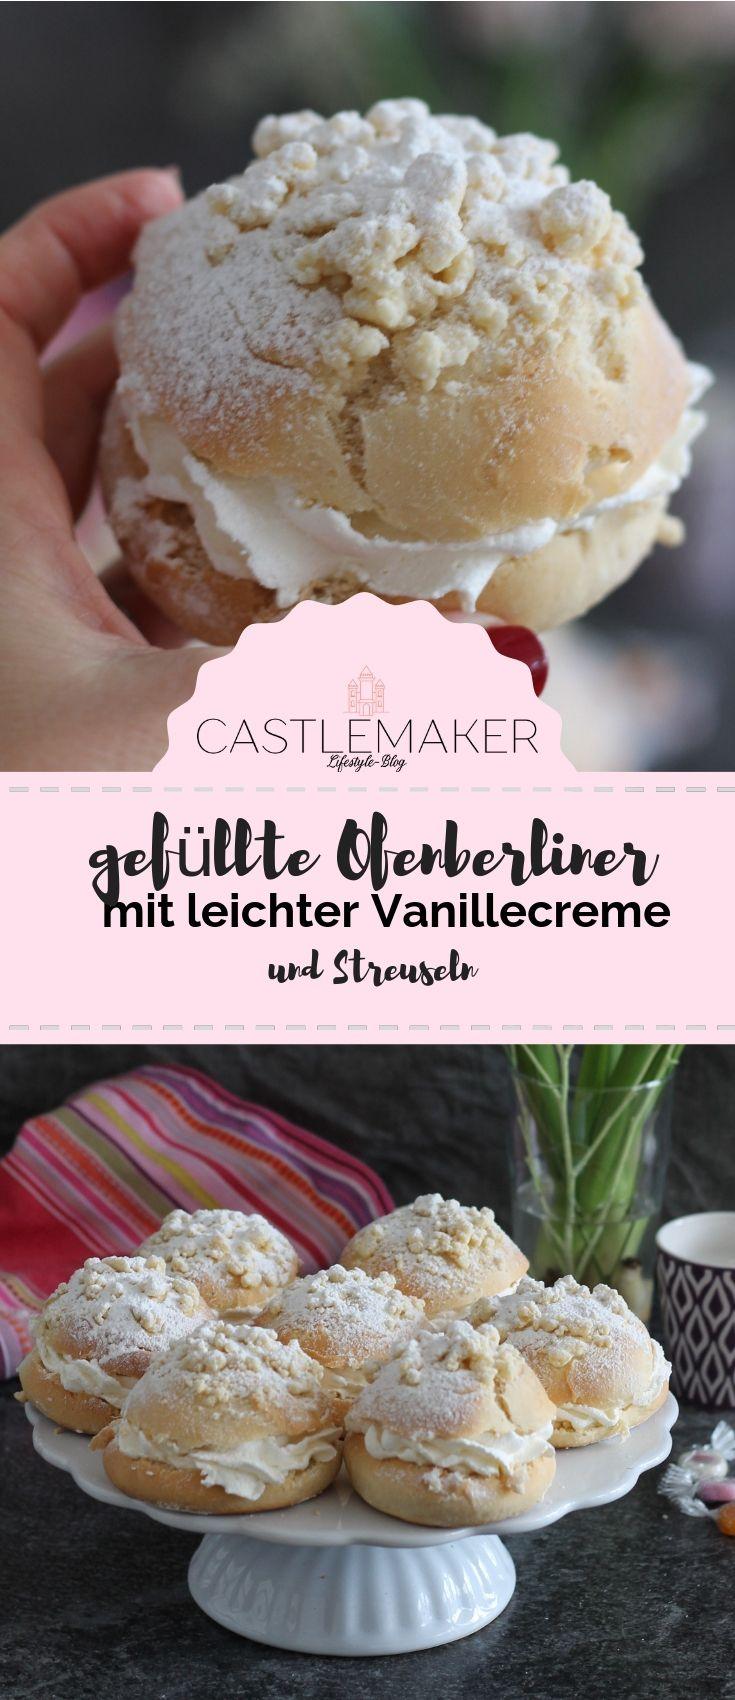 RECIPE // Stuffed streusel taler with vanilla cream – filled oven berliner